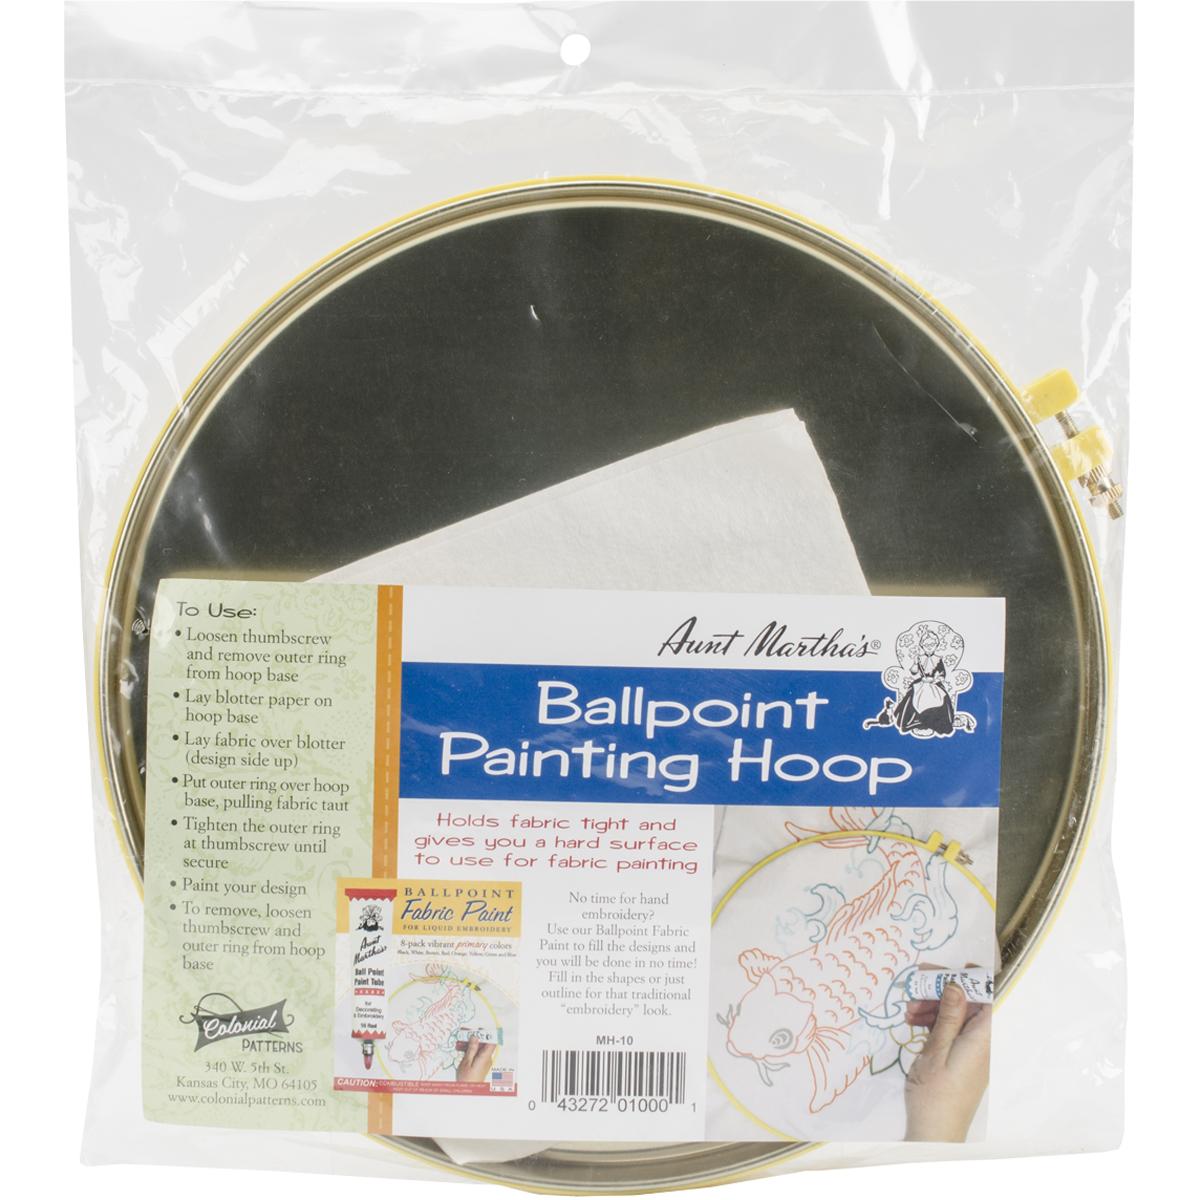 Aunt Martha's Ballpoint Painting Hoop 10-